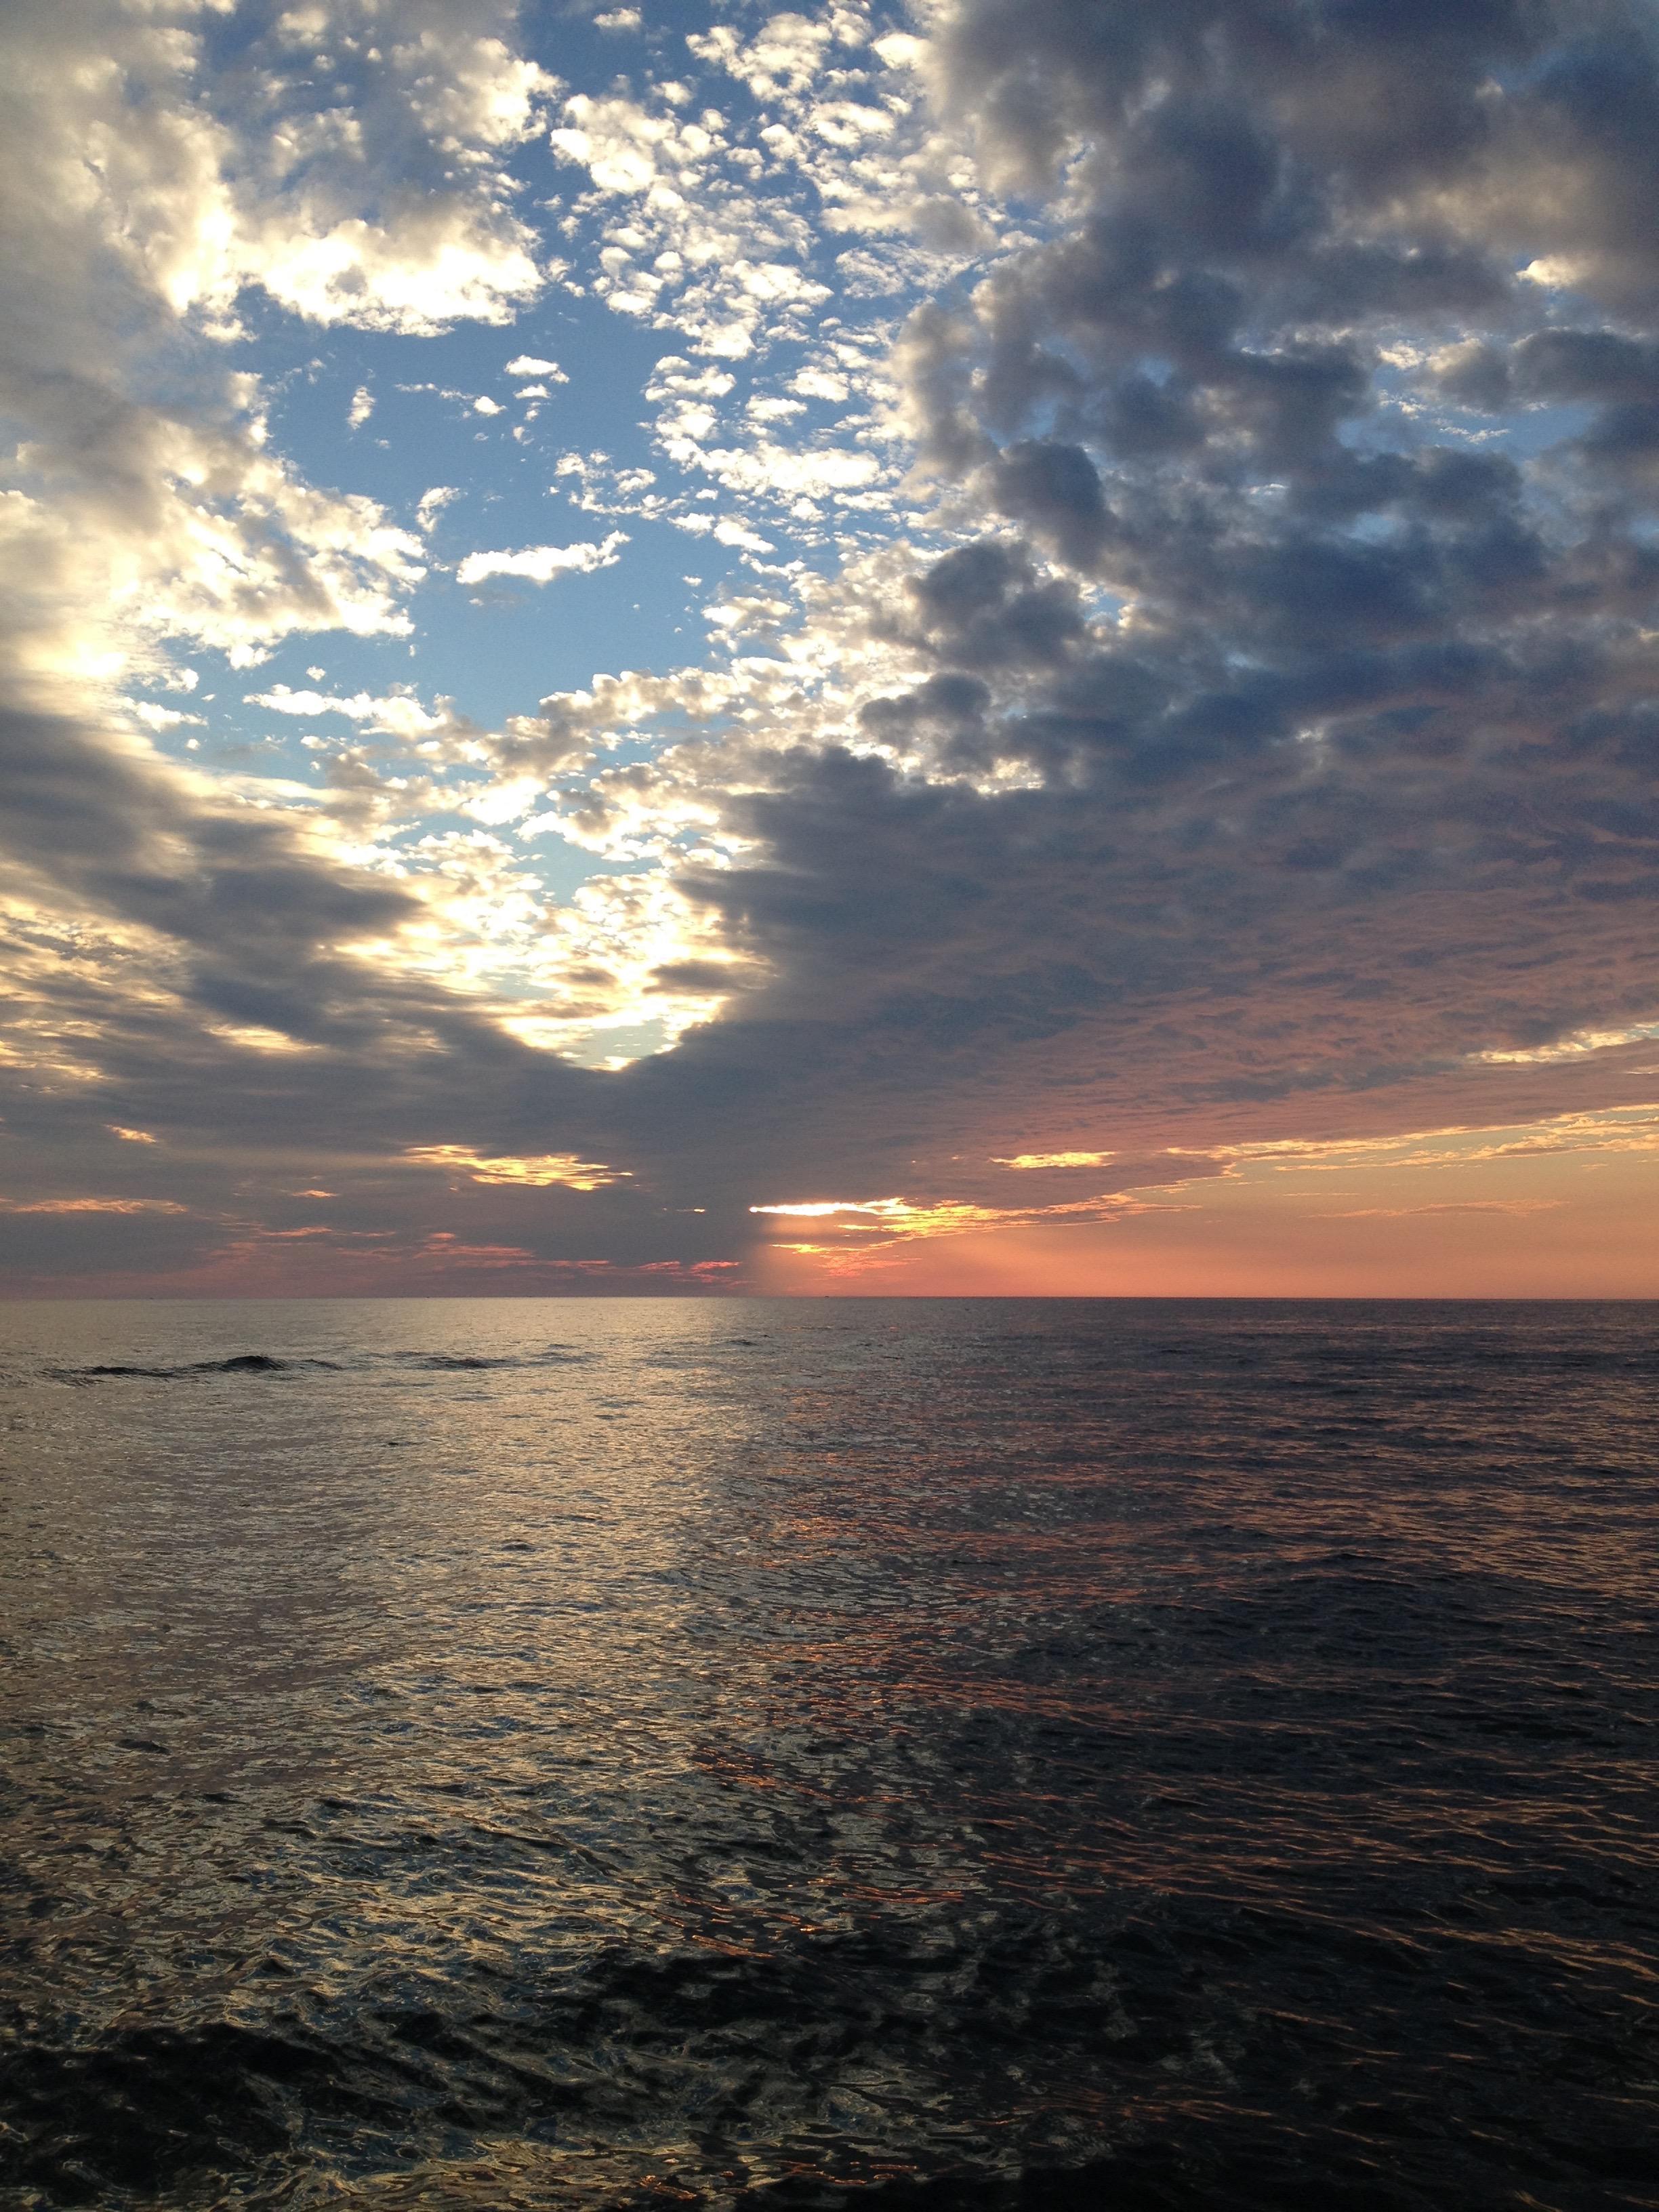 Boating 7:26.jpg